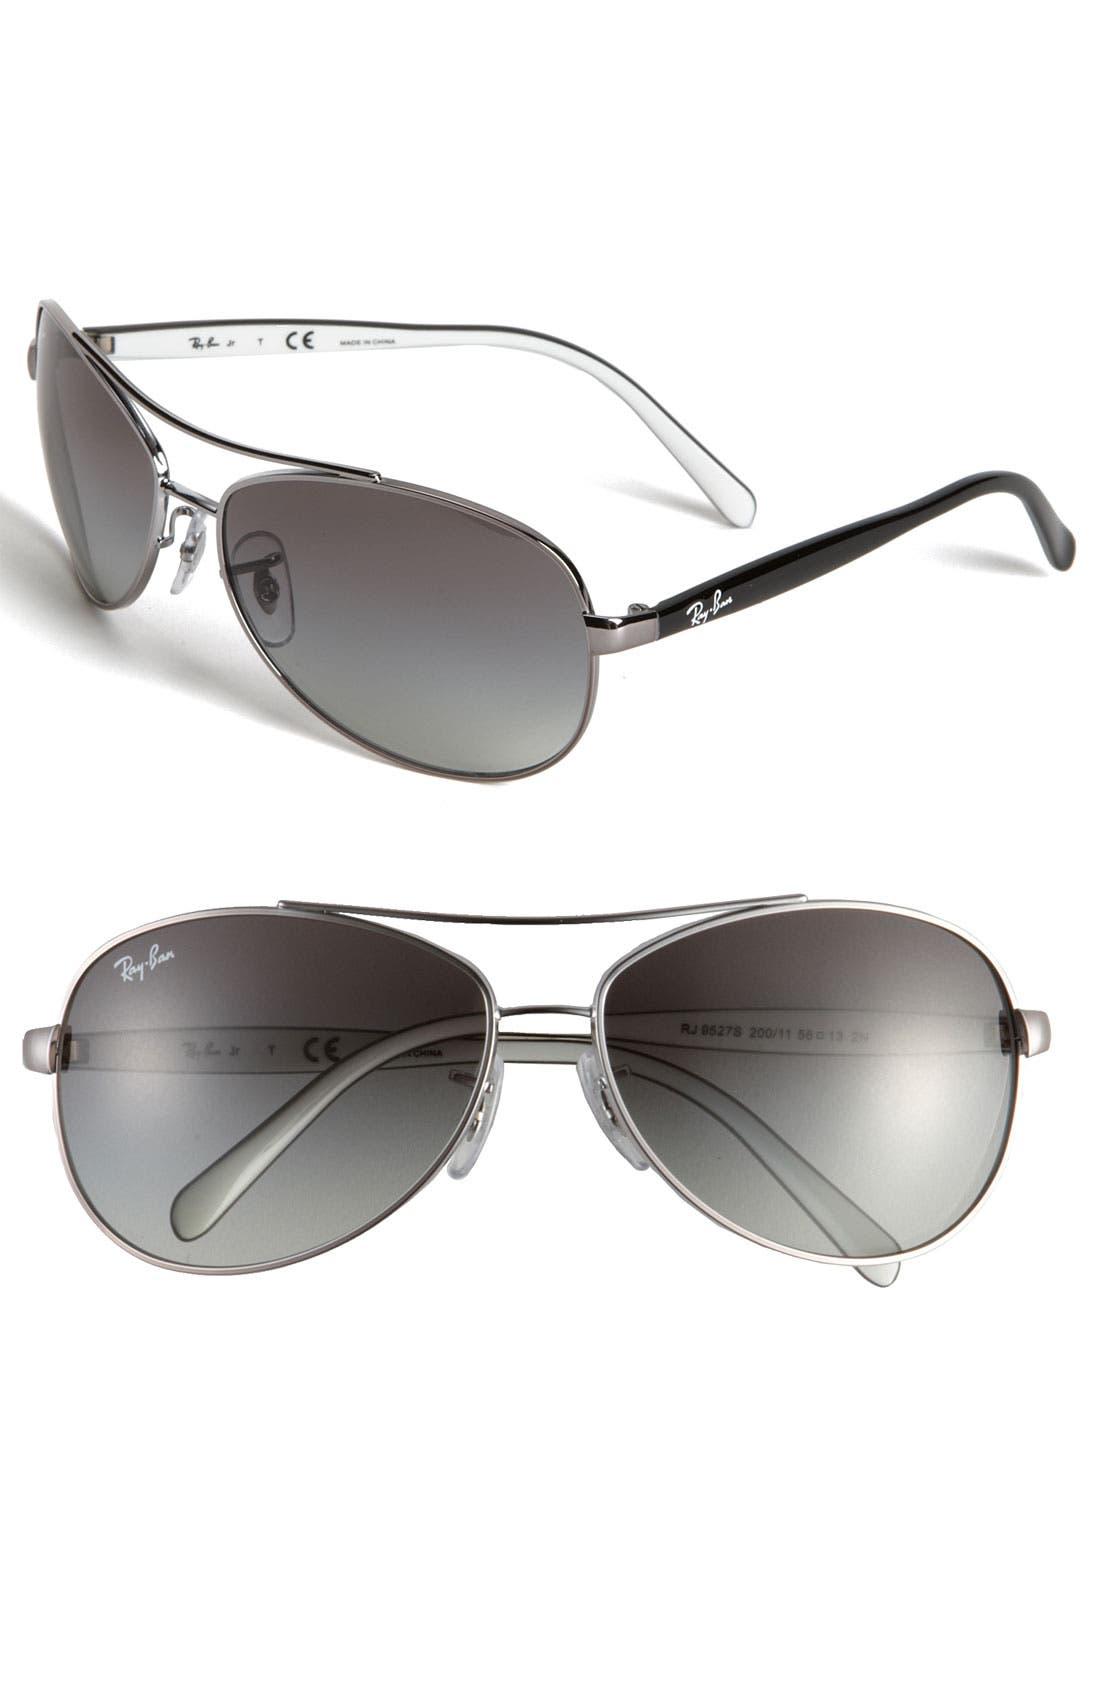 Main Image - Ray-Ban Aviator 56mm Sunglasses (Boys)